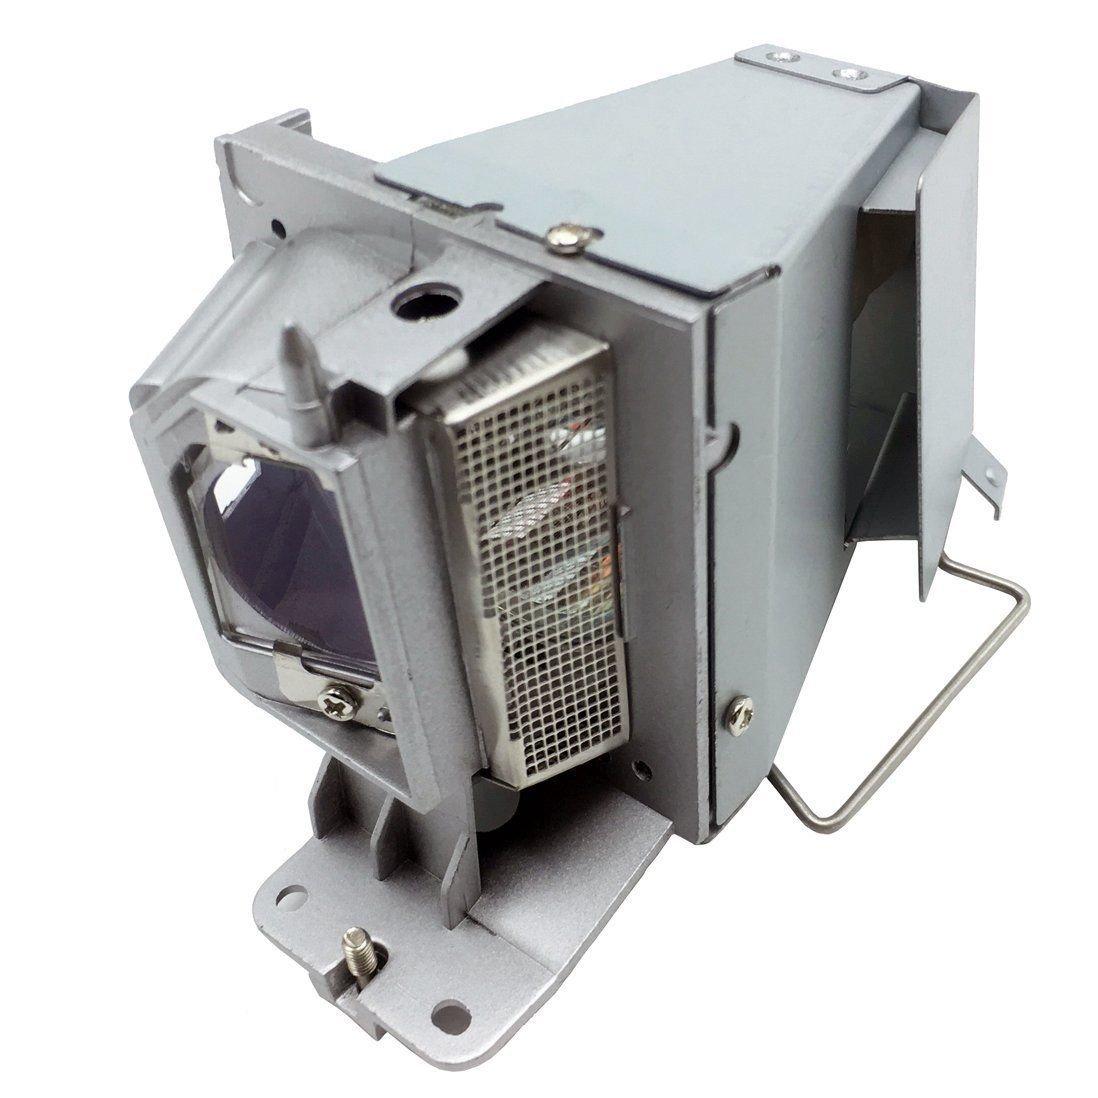 Kingoo 優れたプロジェクターランプ OPTOMA BR323 SP.8VH01GC01 交換用プロジェクターランプ電球 ハウジング付き B074GZLFLT